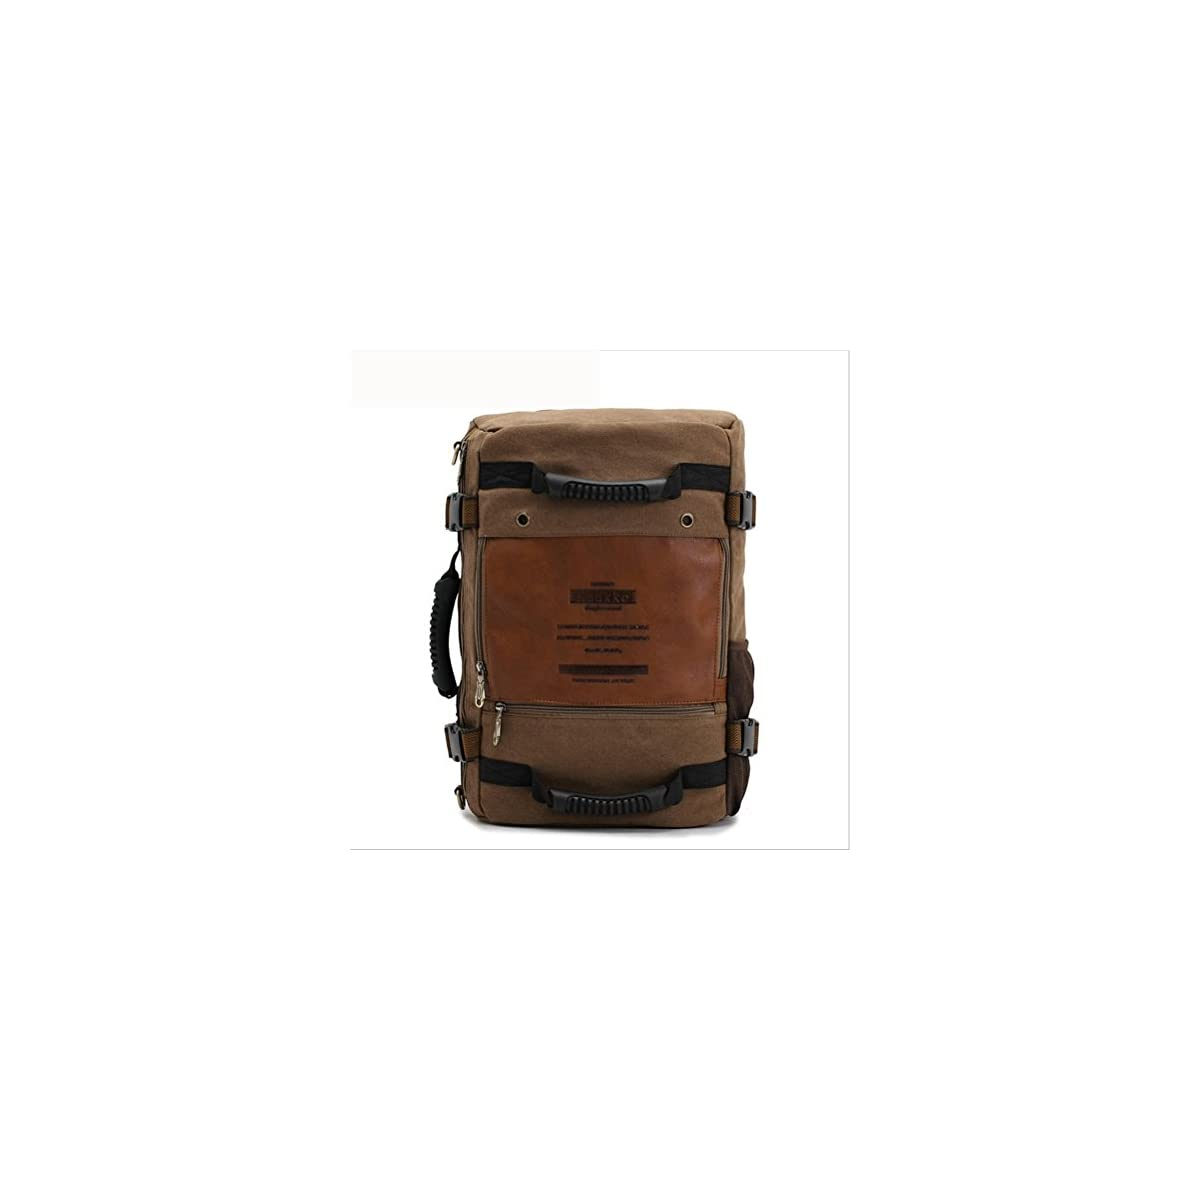 41R42LJP8UL. SS1200  - beibao shop Backpack-Aleatorio Caballero Packs Daypack Moda Lienzo Piel Viaje Senderismo Mochilas Ciudad universitaria Mochila Hombro Bolsa Portátil, Tablet, PC